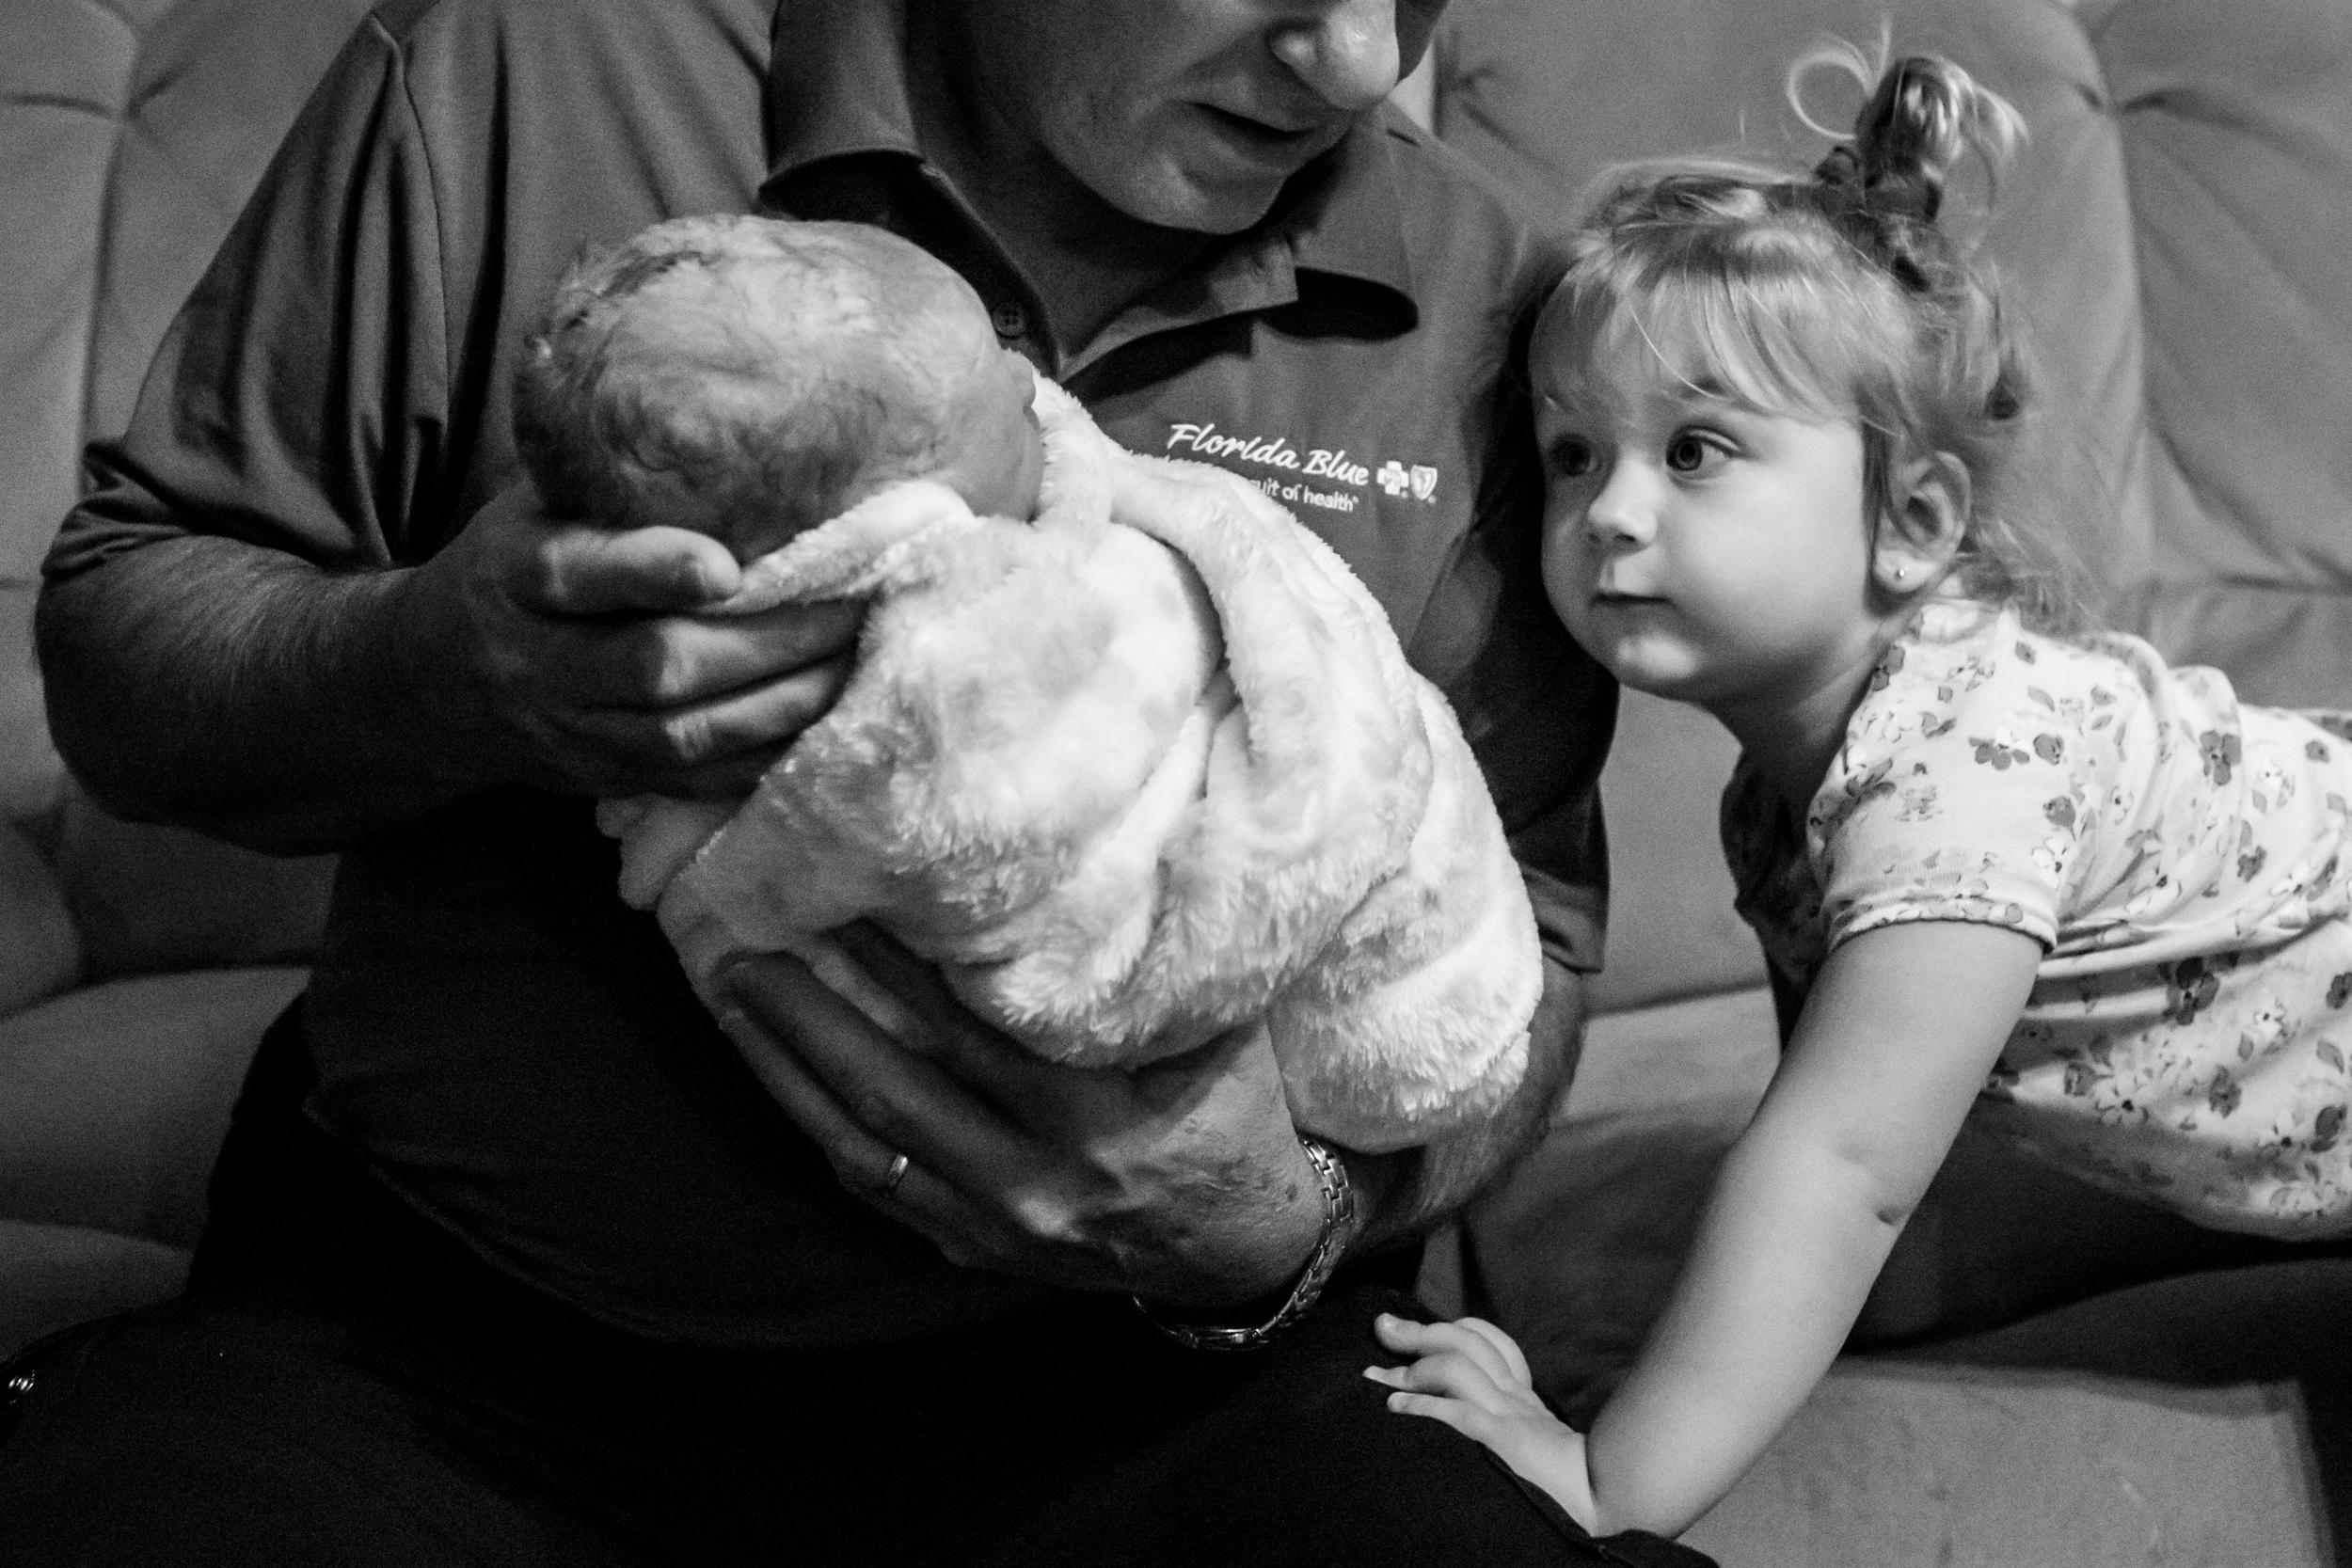 jacksonville-birth-photographer-23.jpg